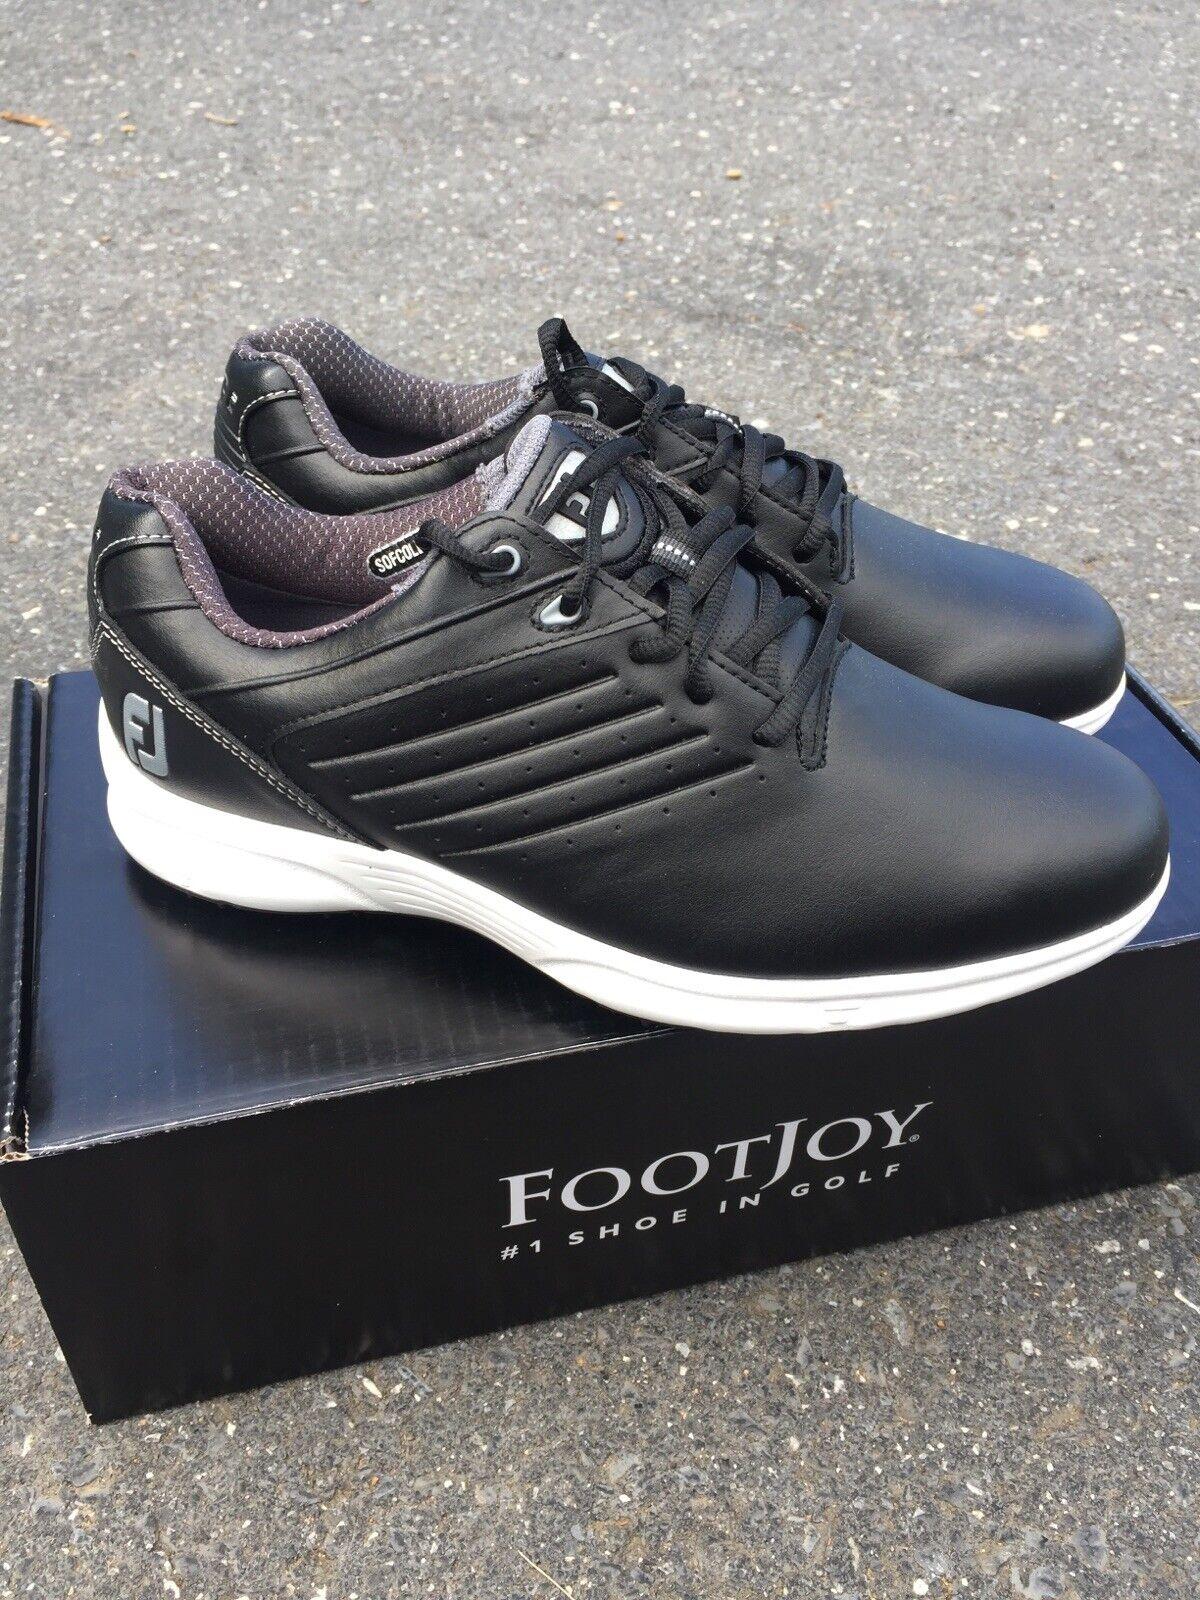 Footjoy Mens Size 8m Black Arc Sl Spikeless Golf Shoes Model 59702 For Sale Online Ebay